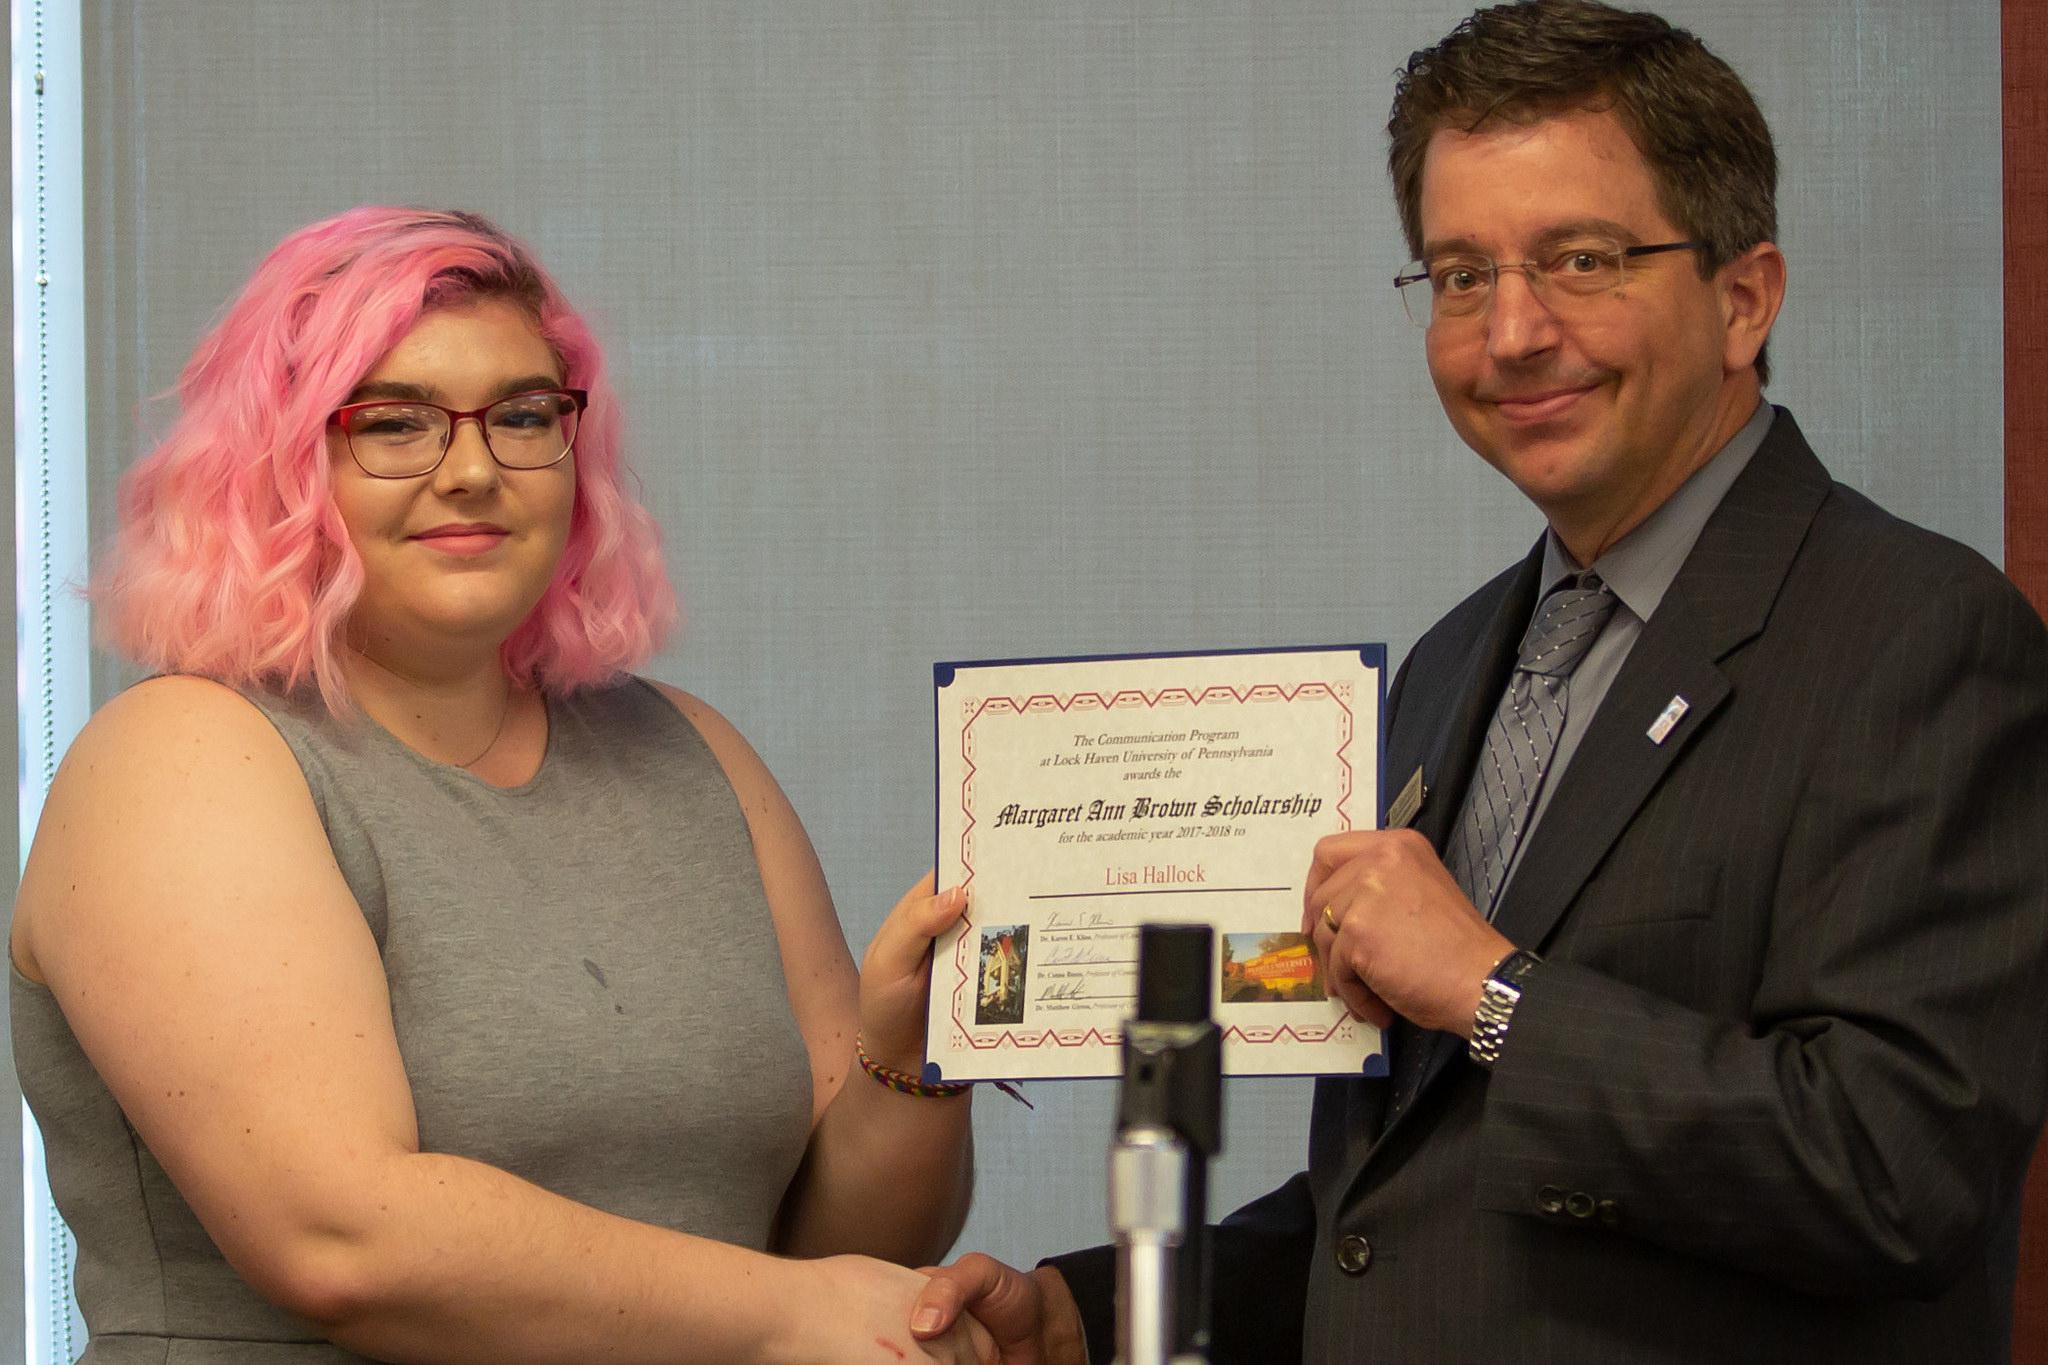 Lisa Hallock – Lisa Hallock, Margaret Ann Brown Scholarship recipient, left, presented by Dr. Matthew Girton, LHU professor.